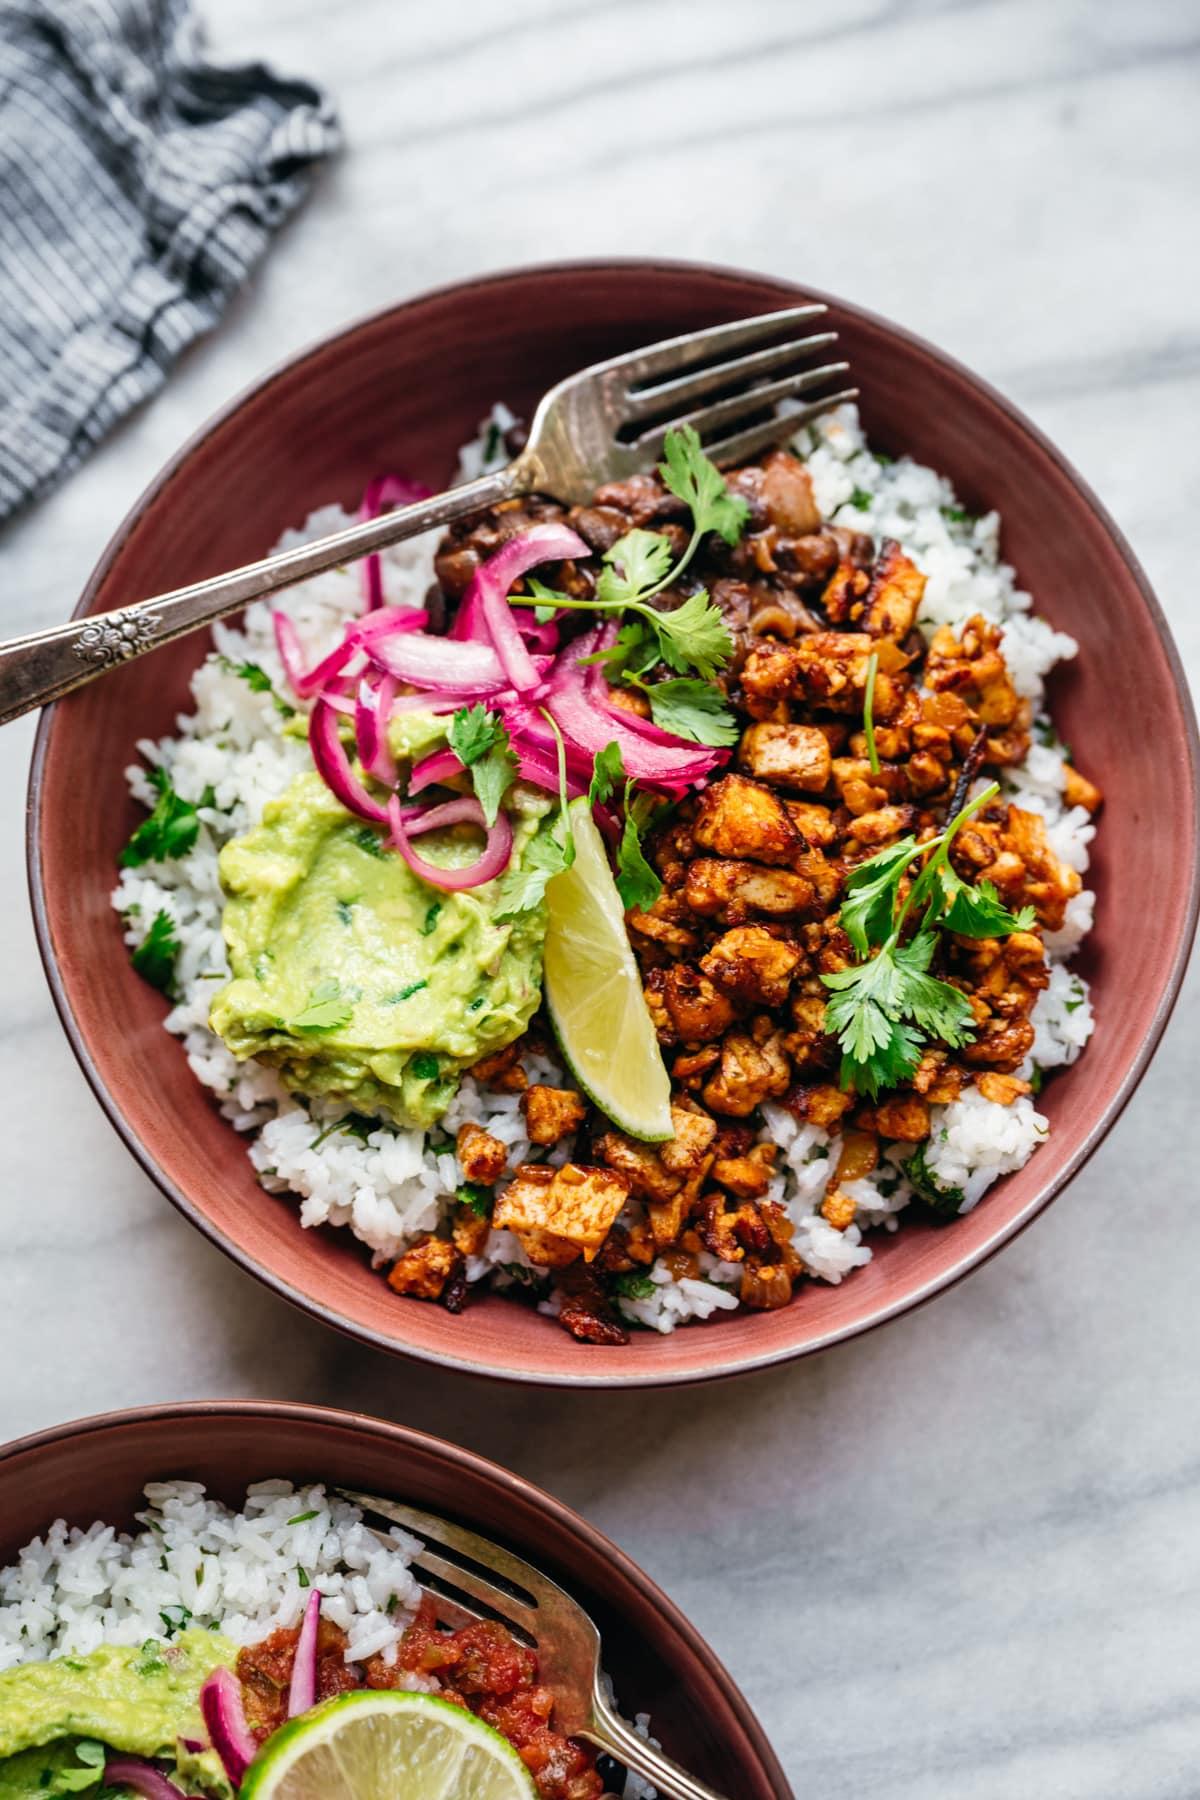 overhead view of vegan burrito bowl with sofritas tofu, guacamole and rice.